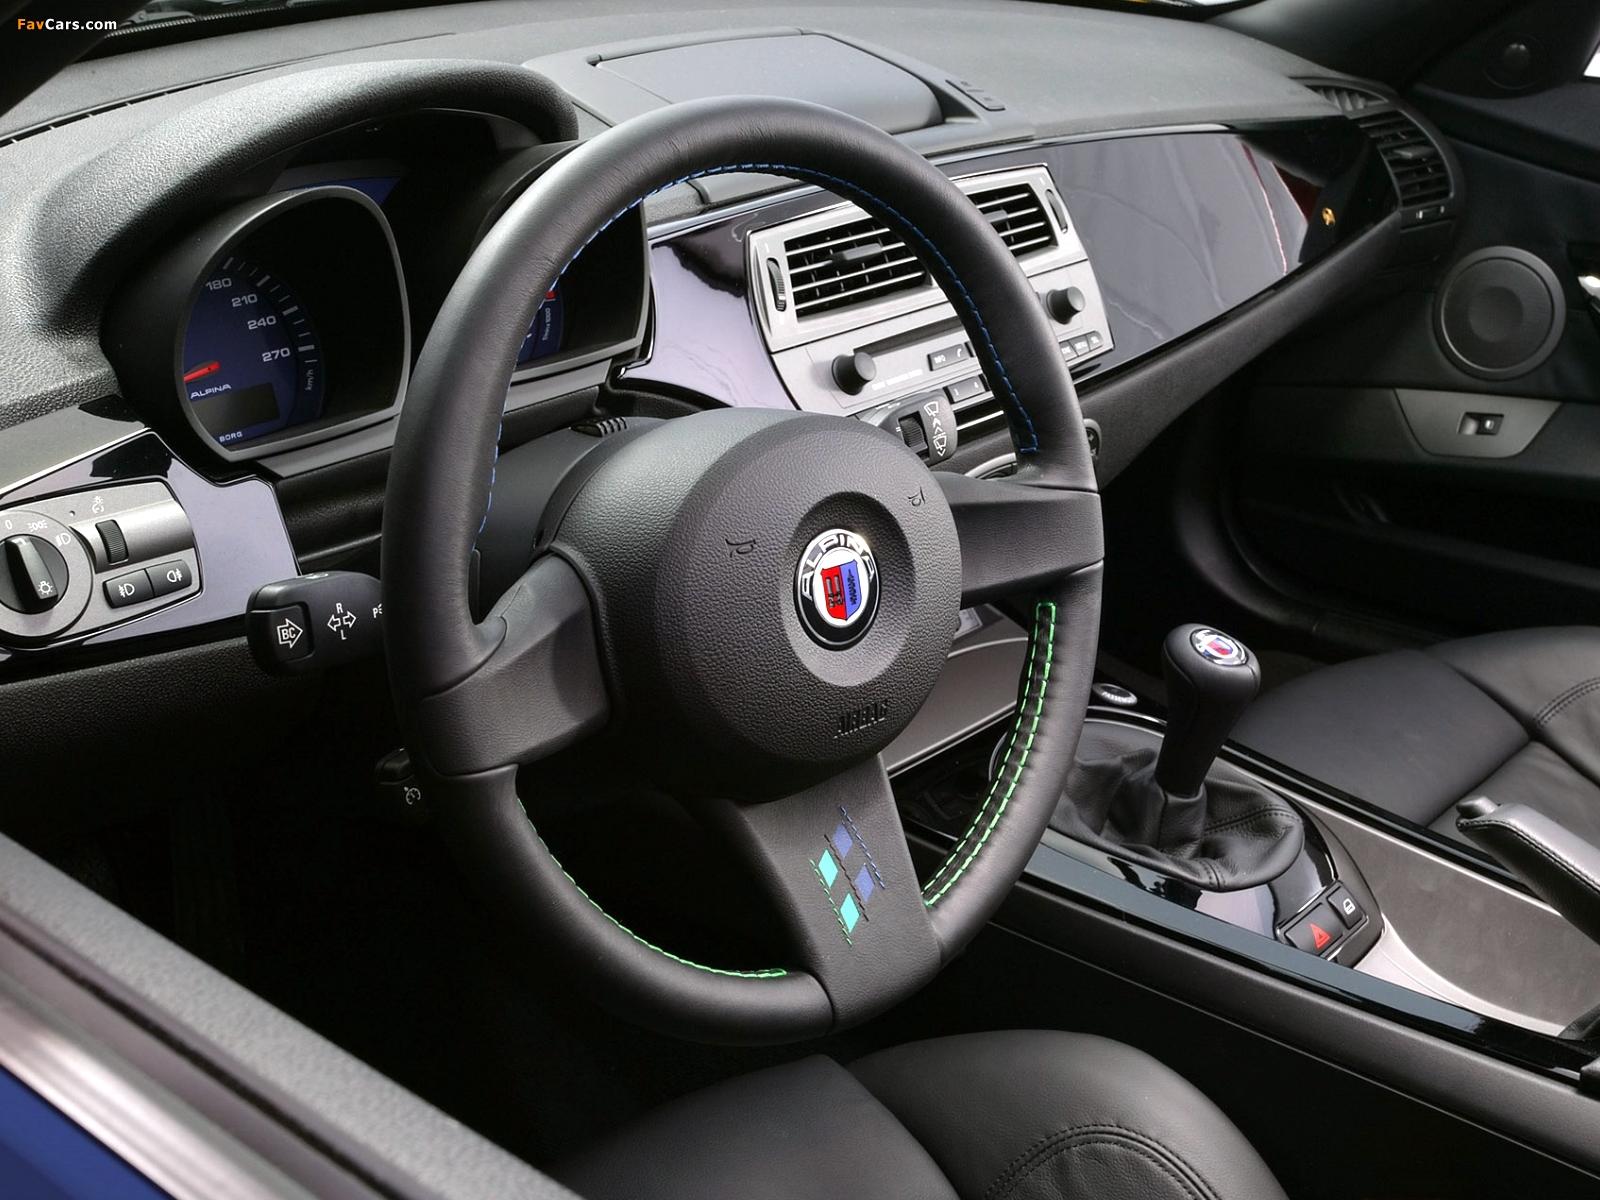 Bmw z4 car images